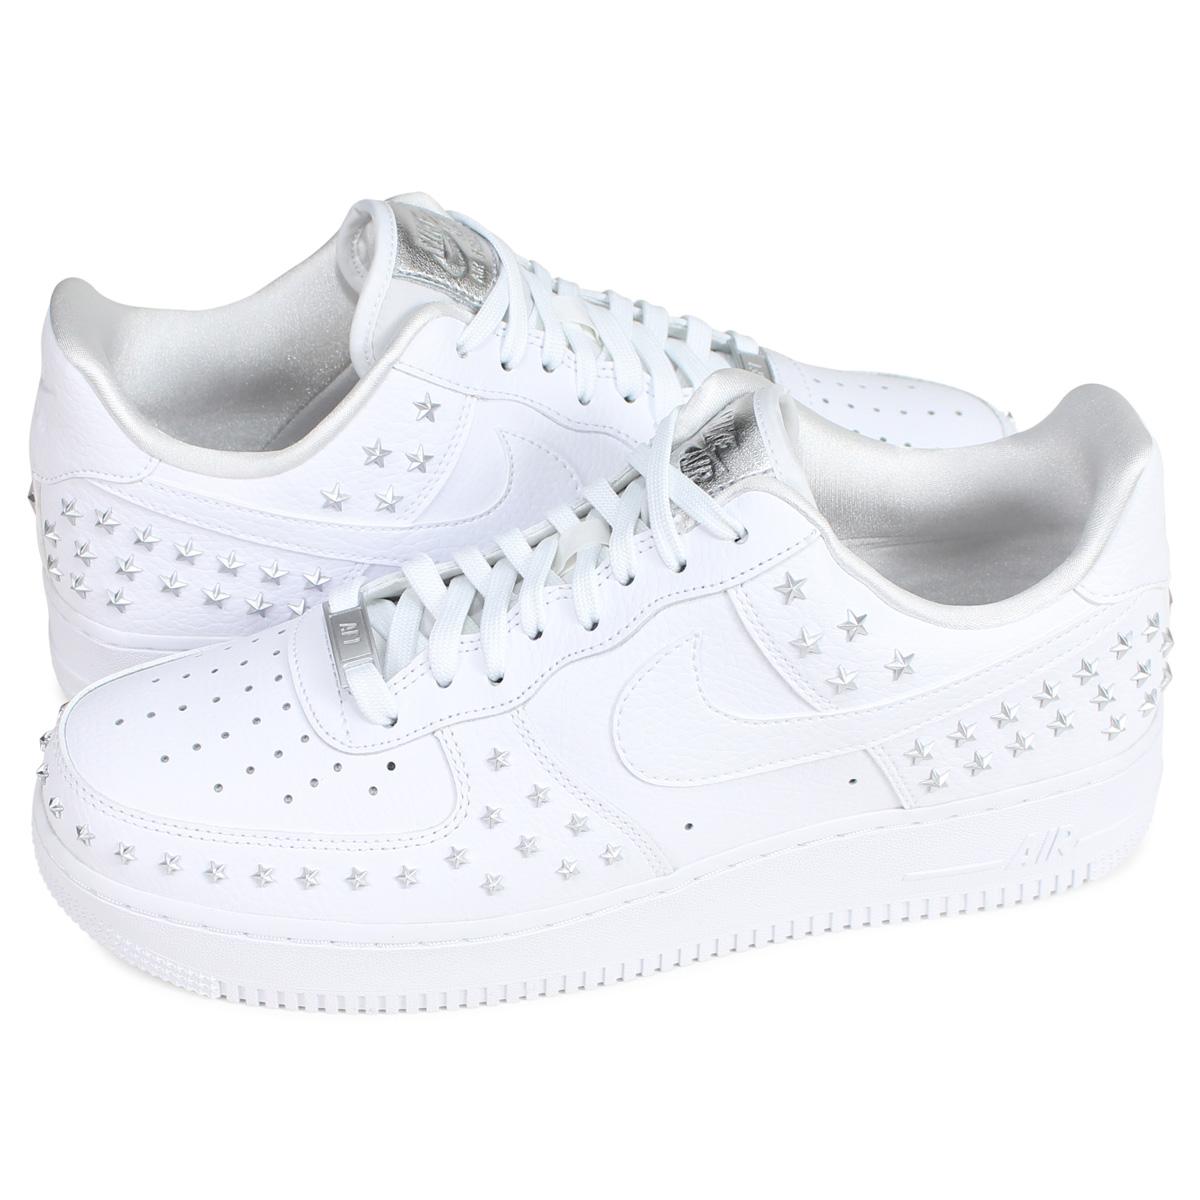 Nike NIKE air force 1 sneakers men WMNS AIR FORCE 1 07 XX white white AR0639 100 [193]